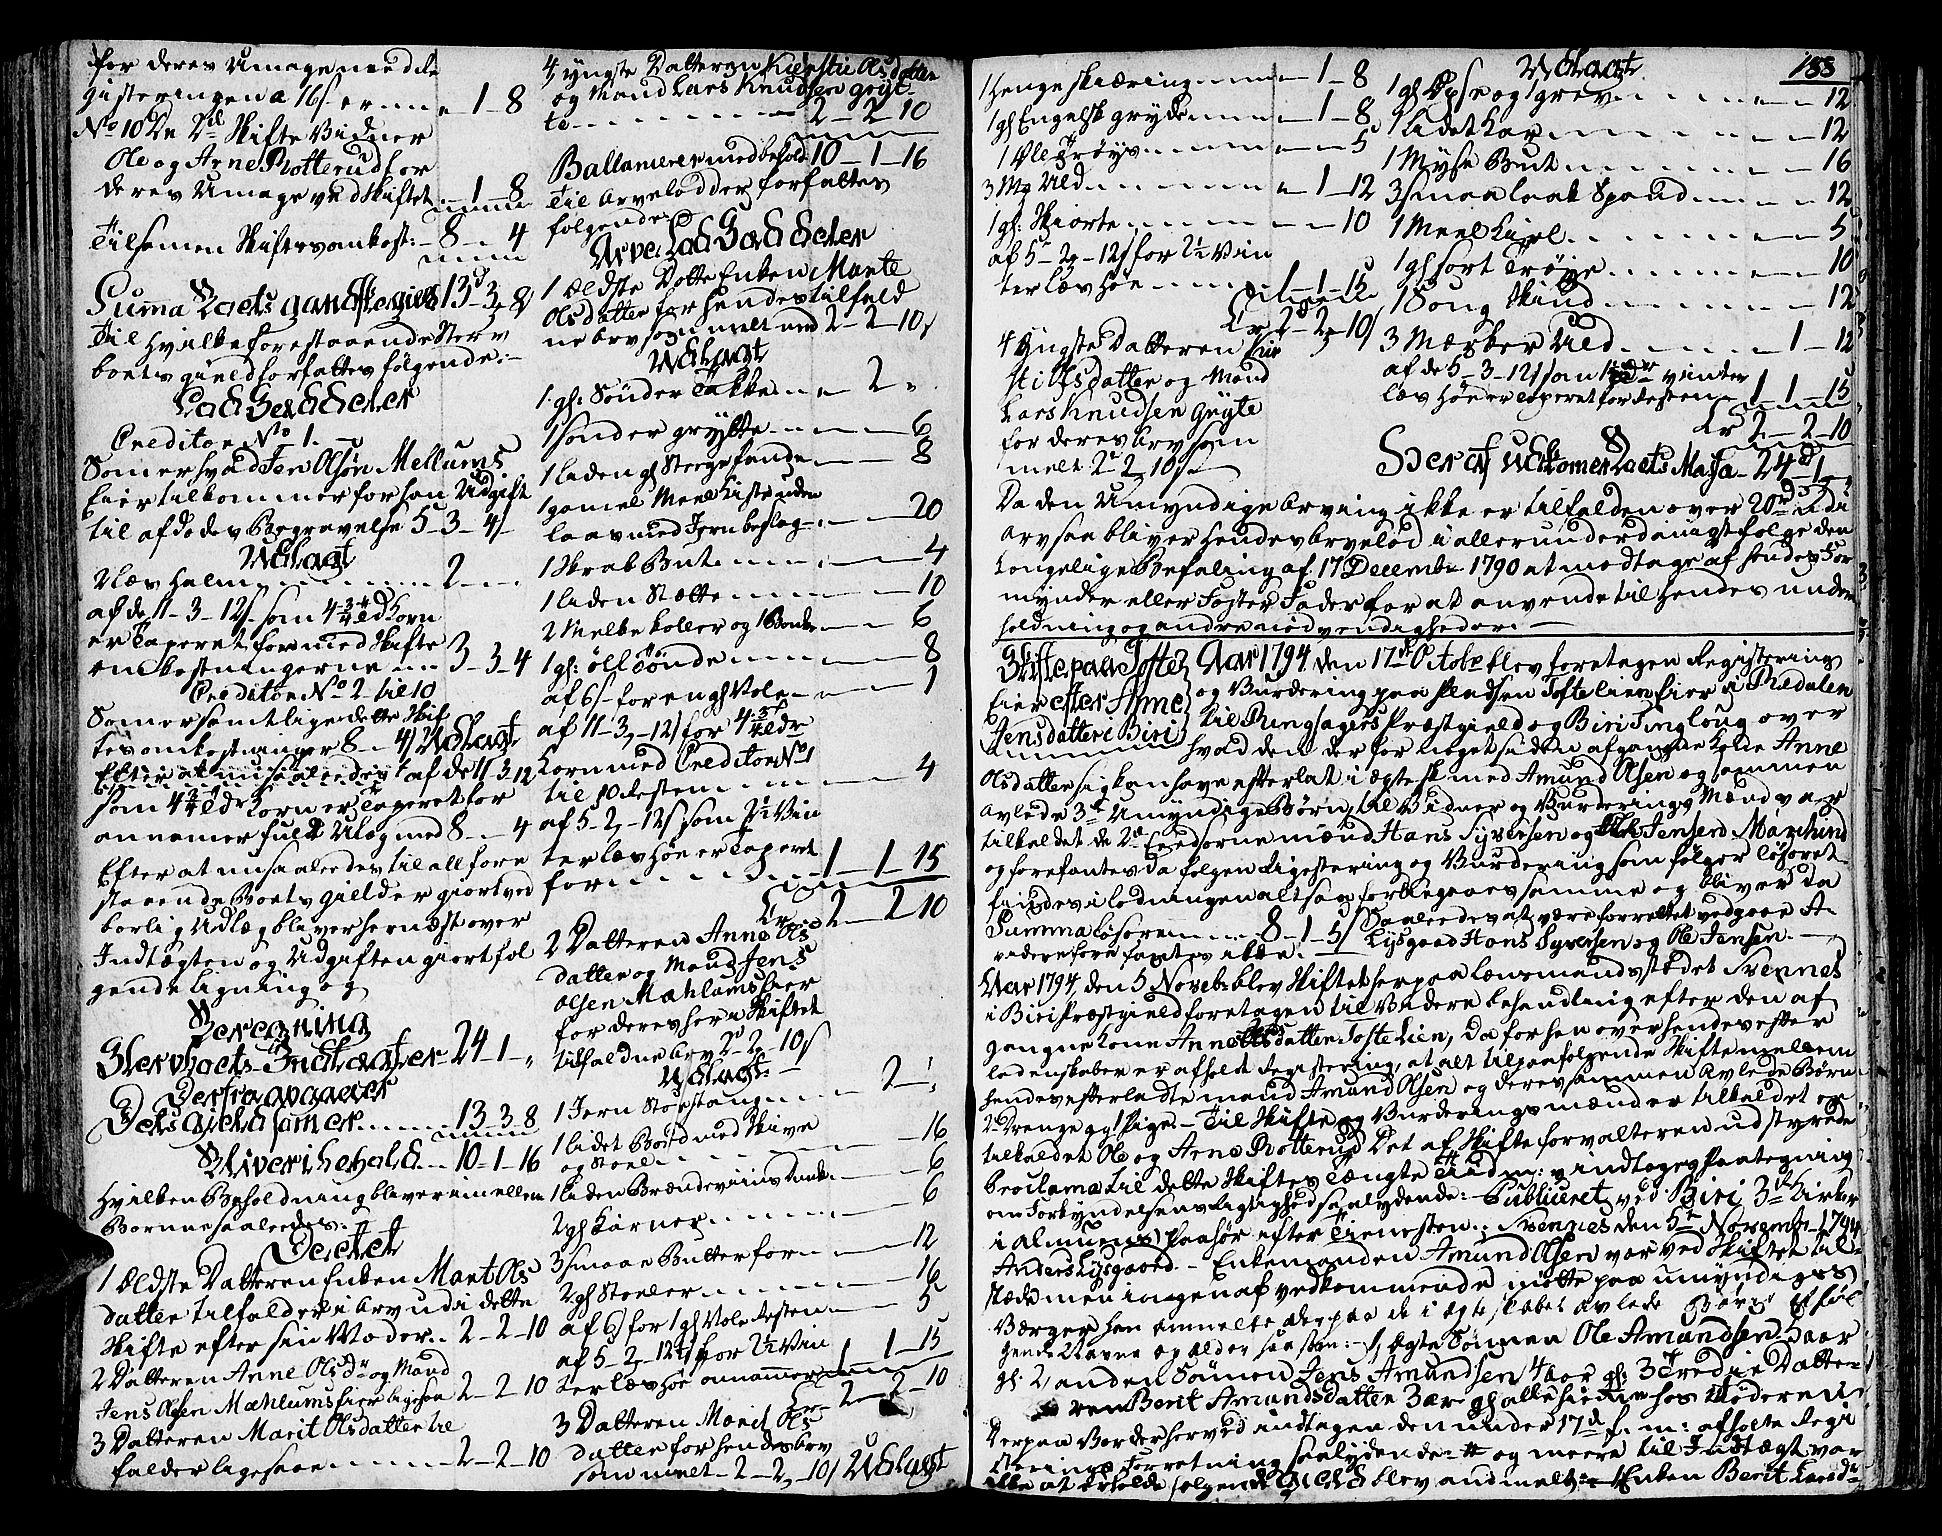 SAH, Toten tingrett, J/Ja/L0012: Skifteprotokoll, 1791-1810, s. 187b-188a